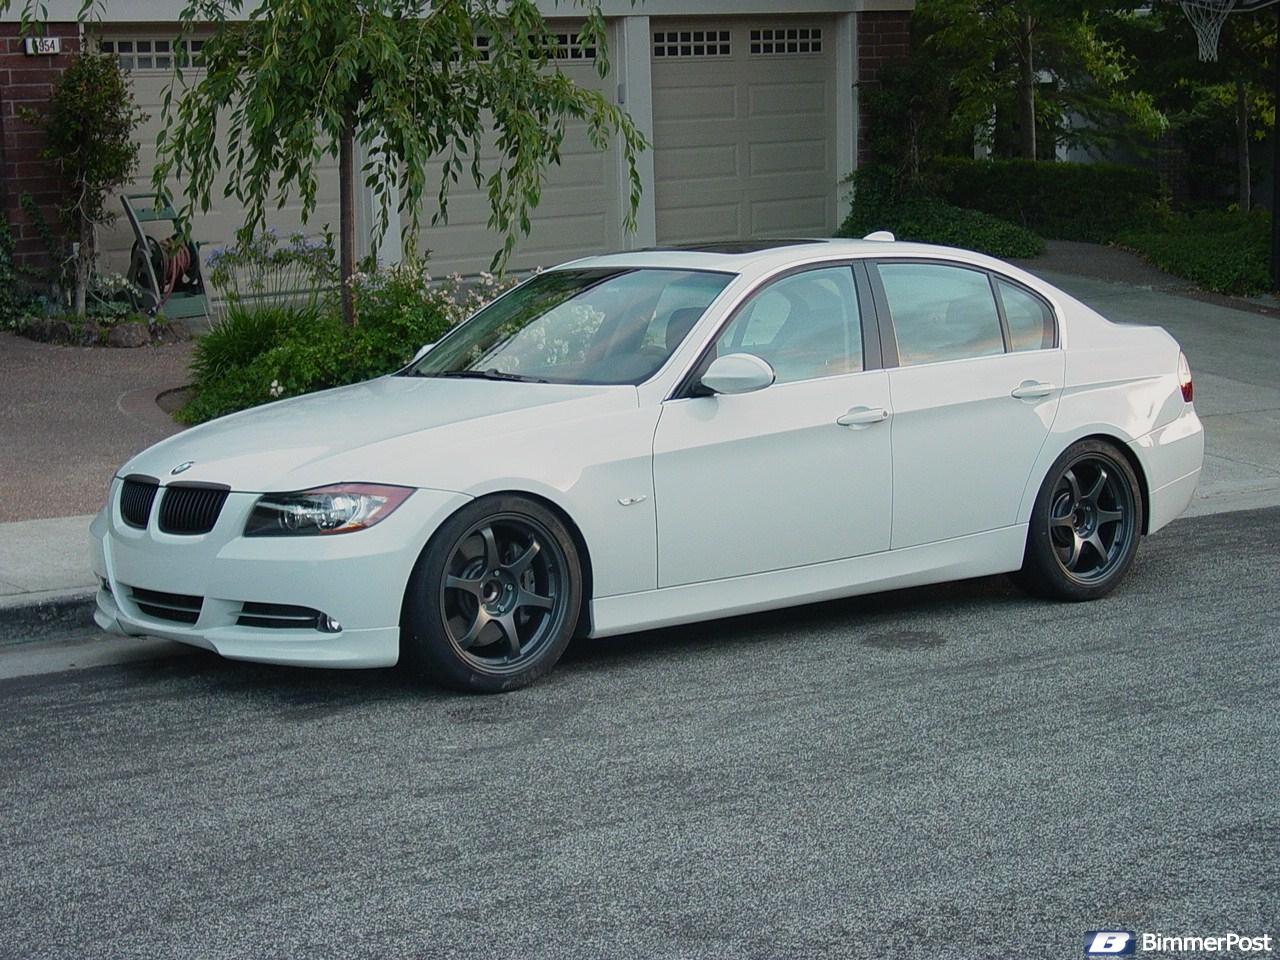 Bmw I For Sale The Best Famous BMW - 2006 bmw 335i